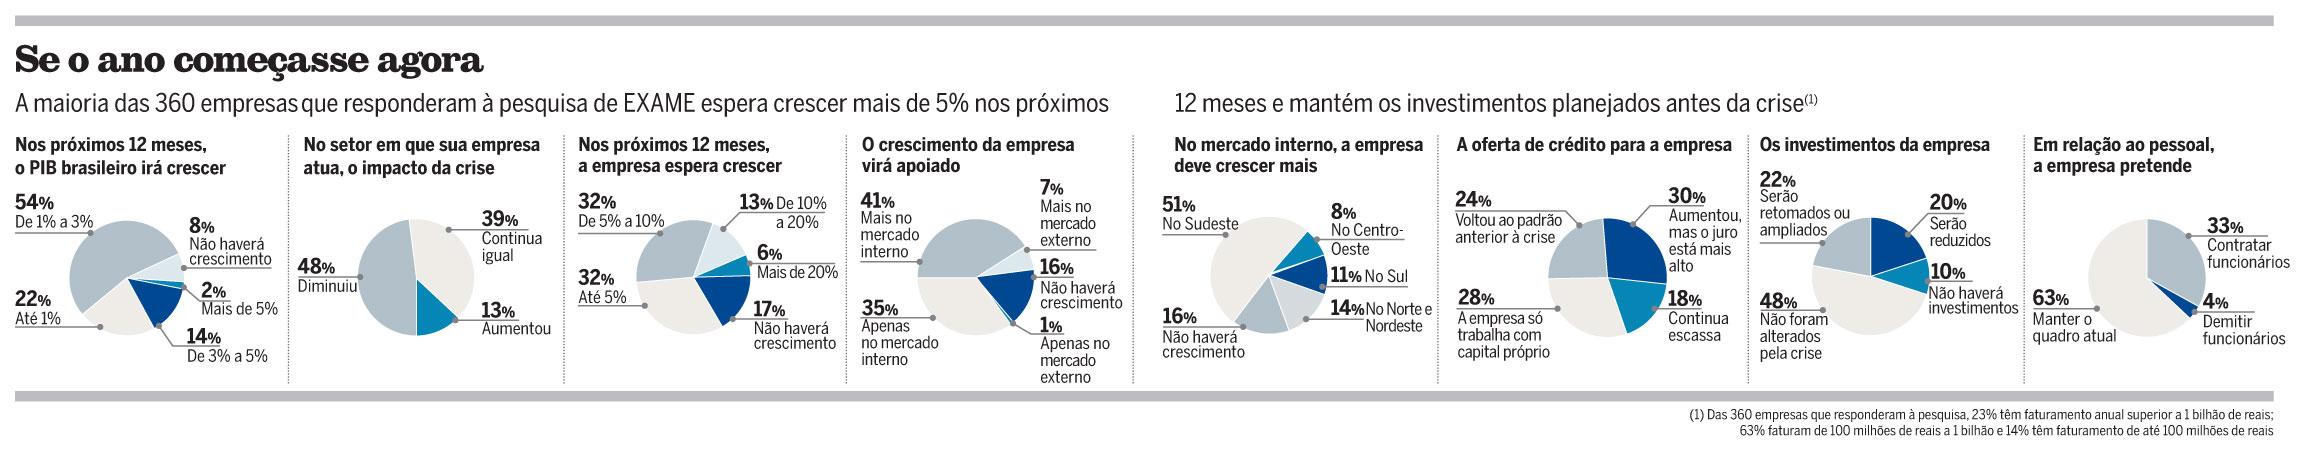 Tabela Crise2